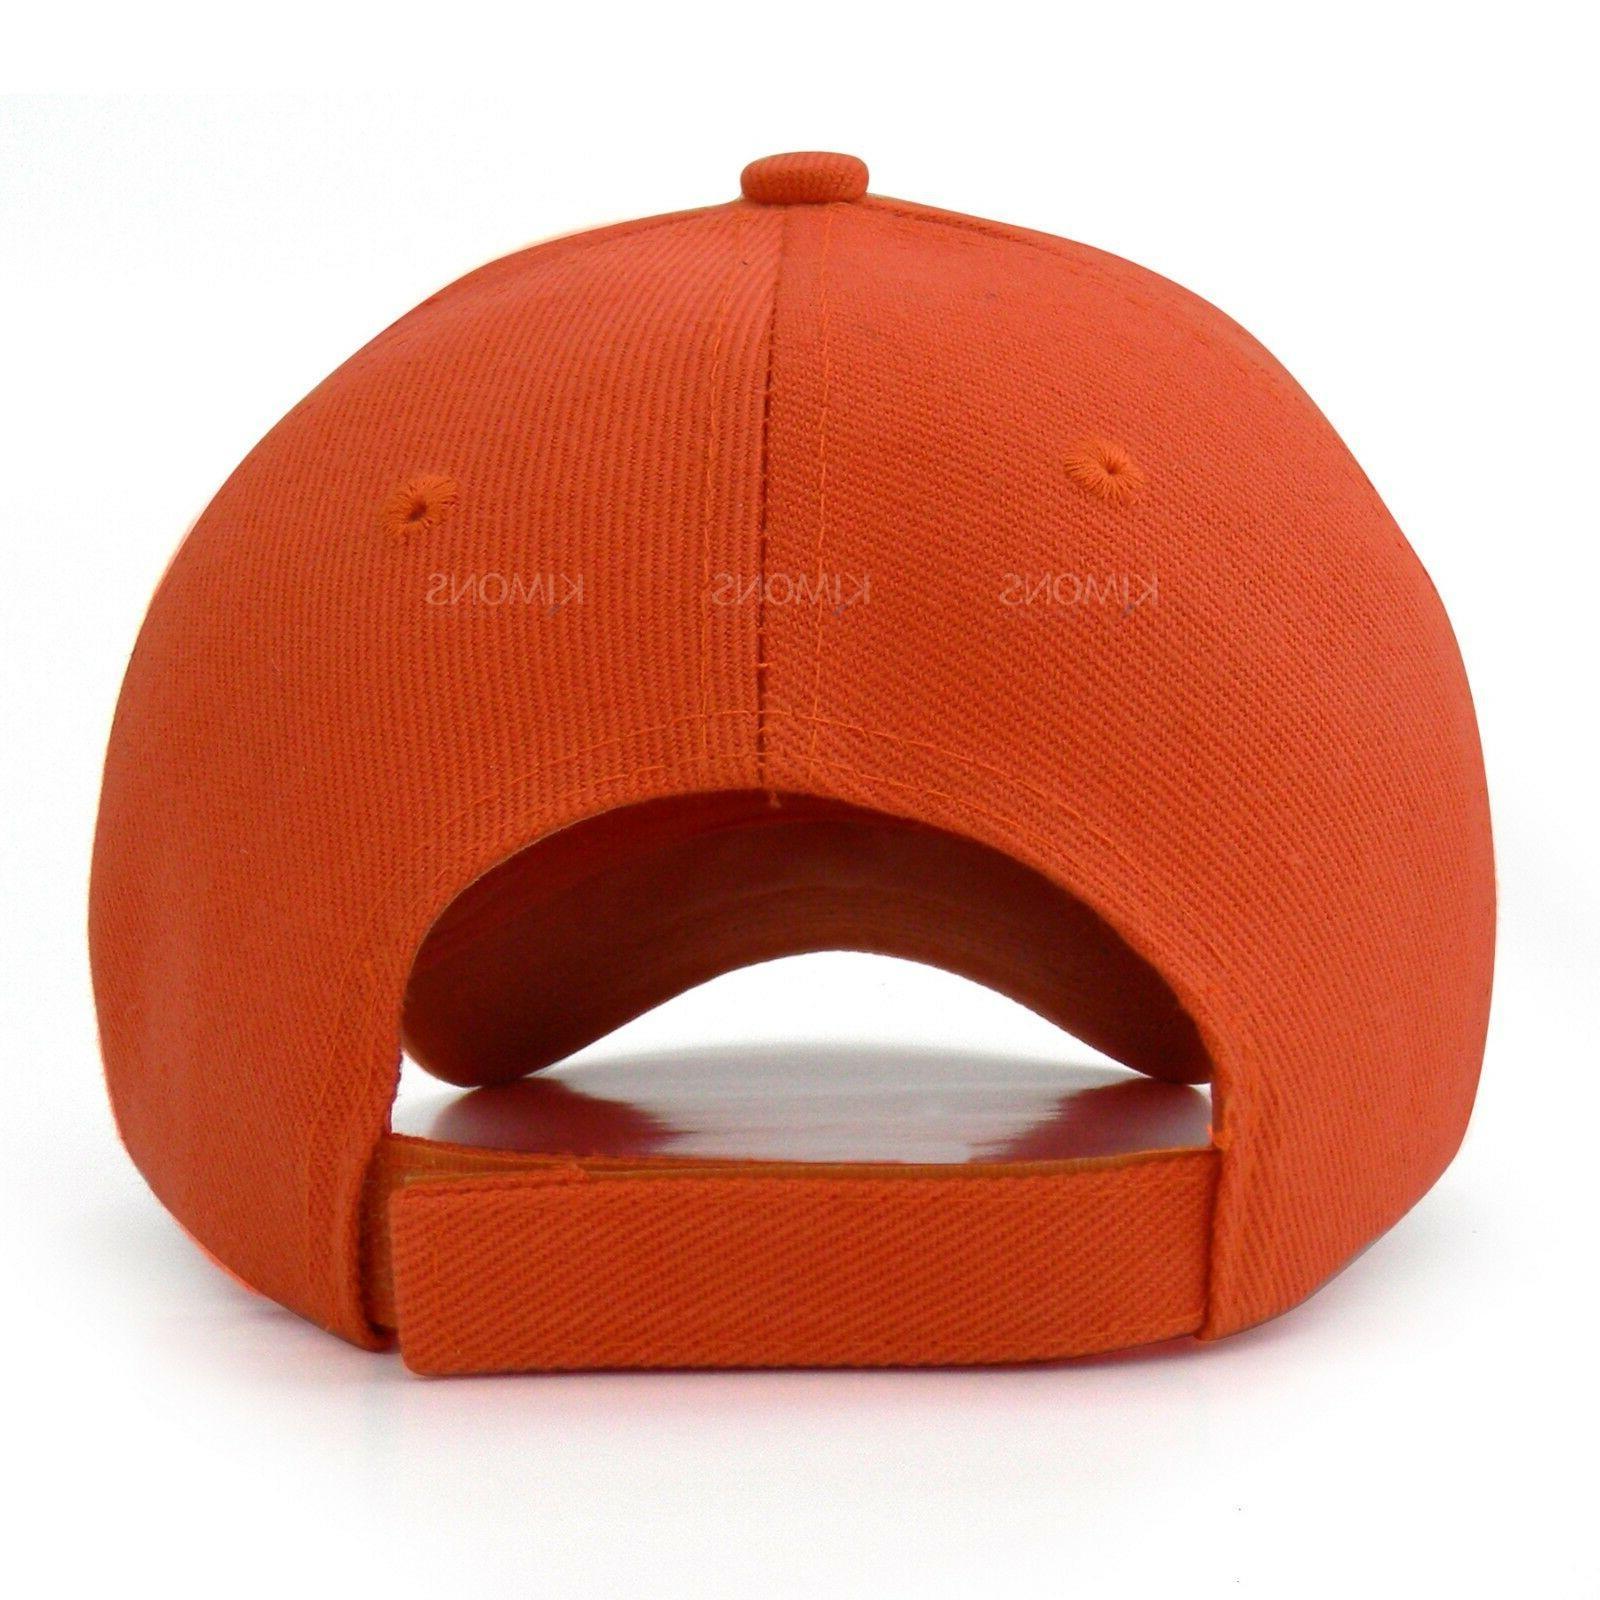 Loop Plain Solid Color Visor Adjustable Mens